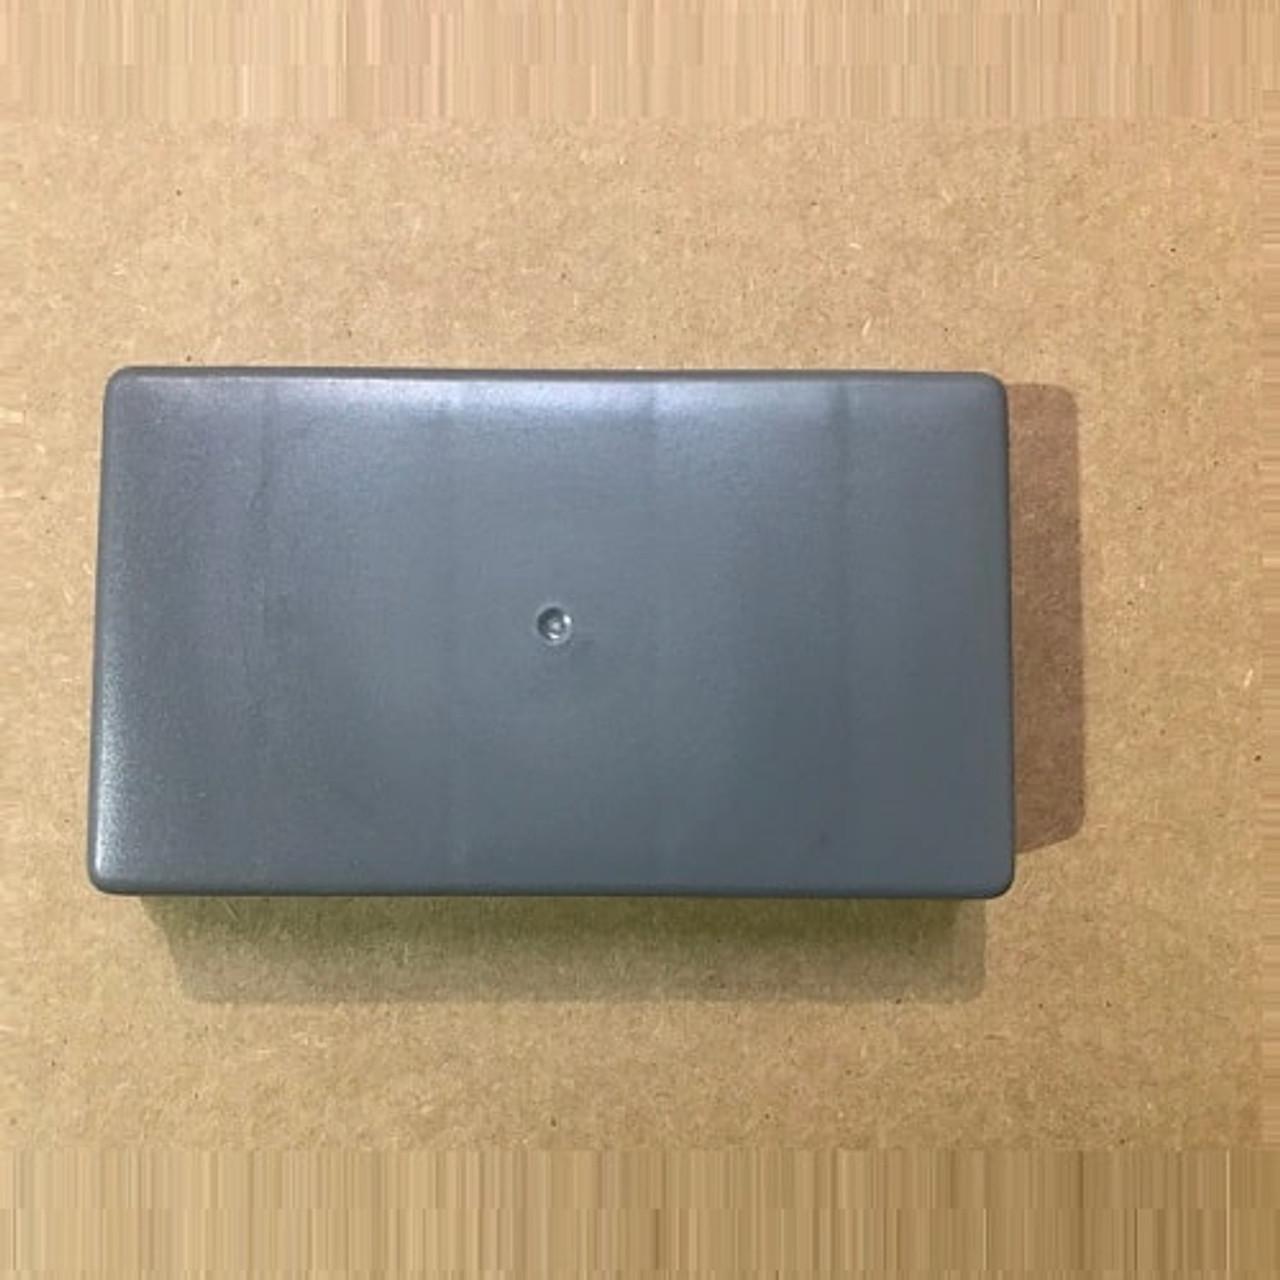 Battery-cover-for-all-Trailmastr-go-karts-and-UTVs